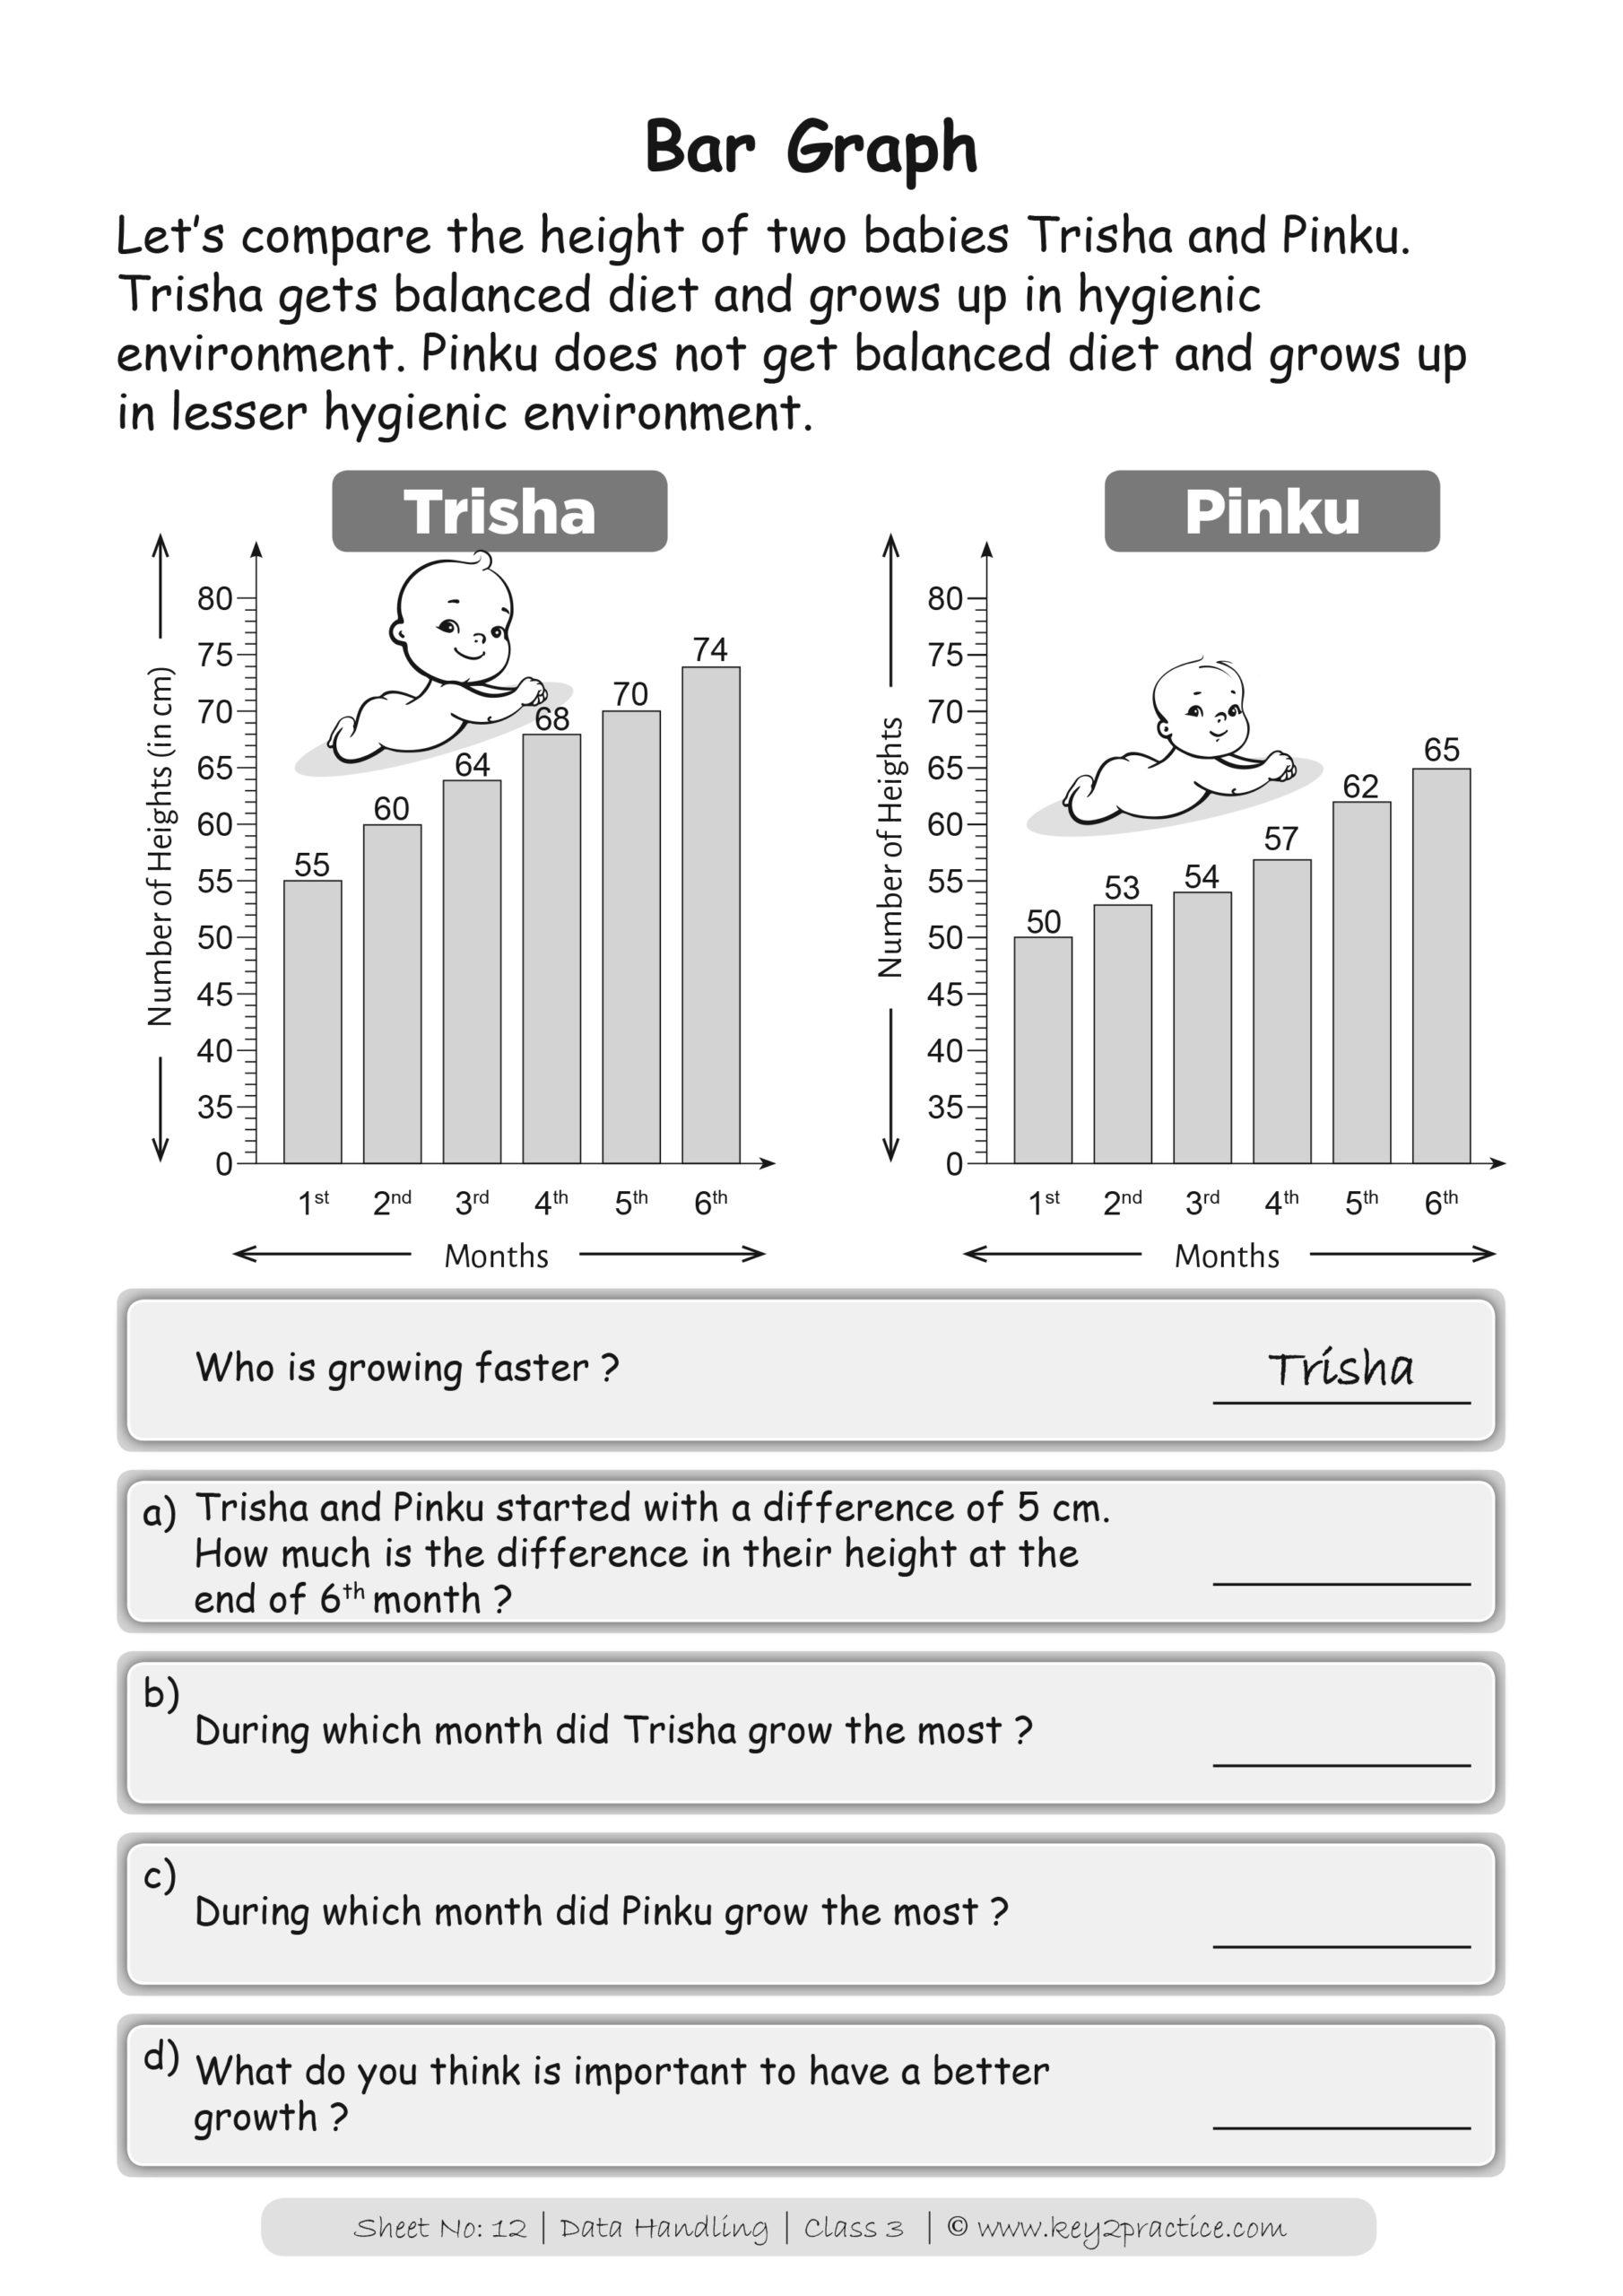 Bar Graph Grade 3 I Maths Worksheets - key2practice Workbooks